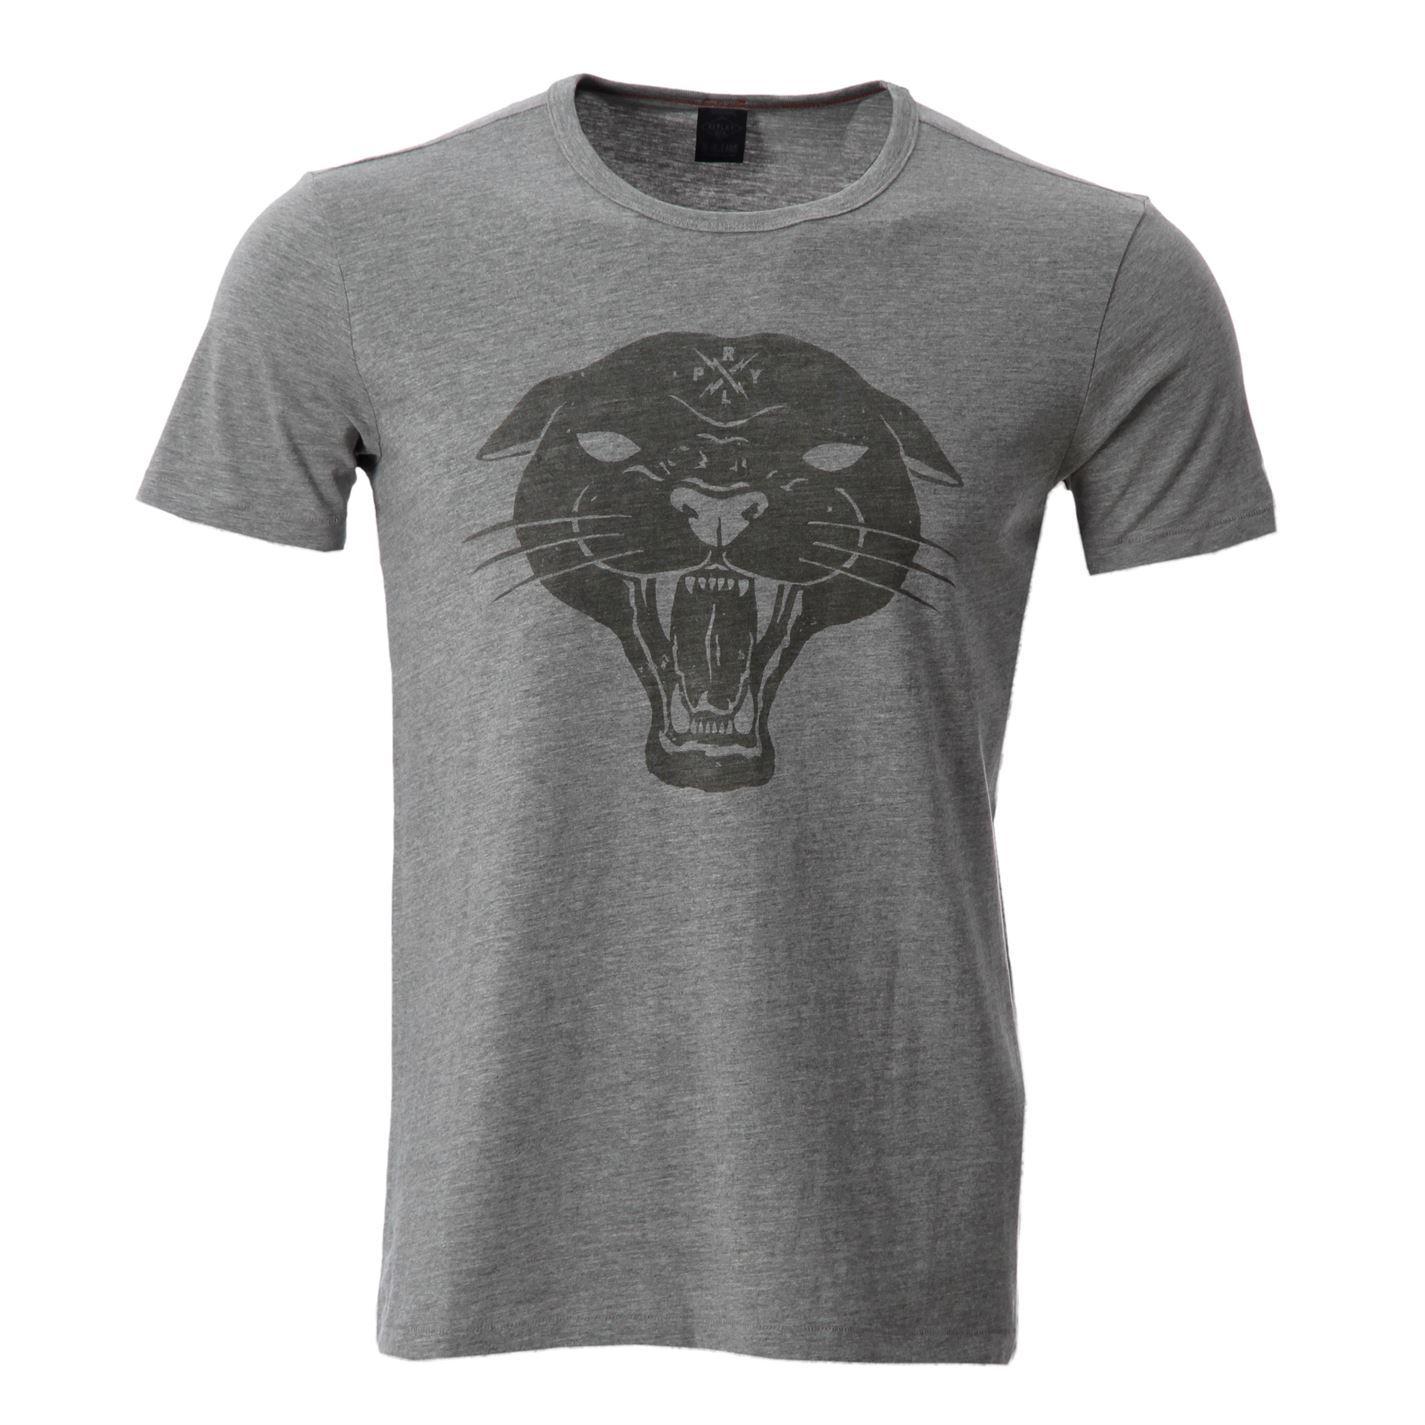 Replay Print Tee T Shirt Snr51 Mens Gents Ebay